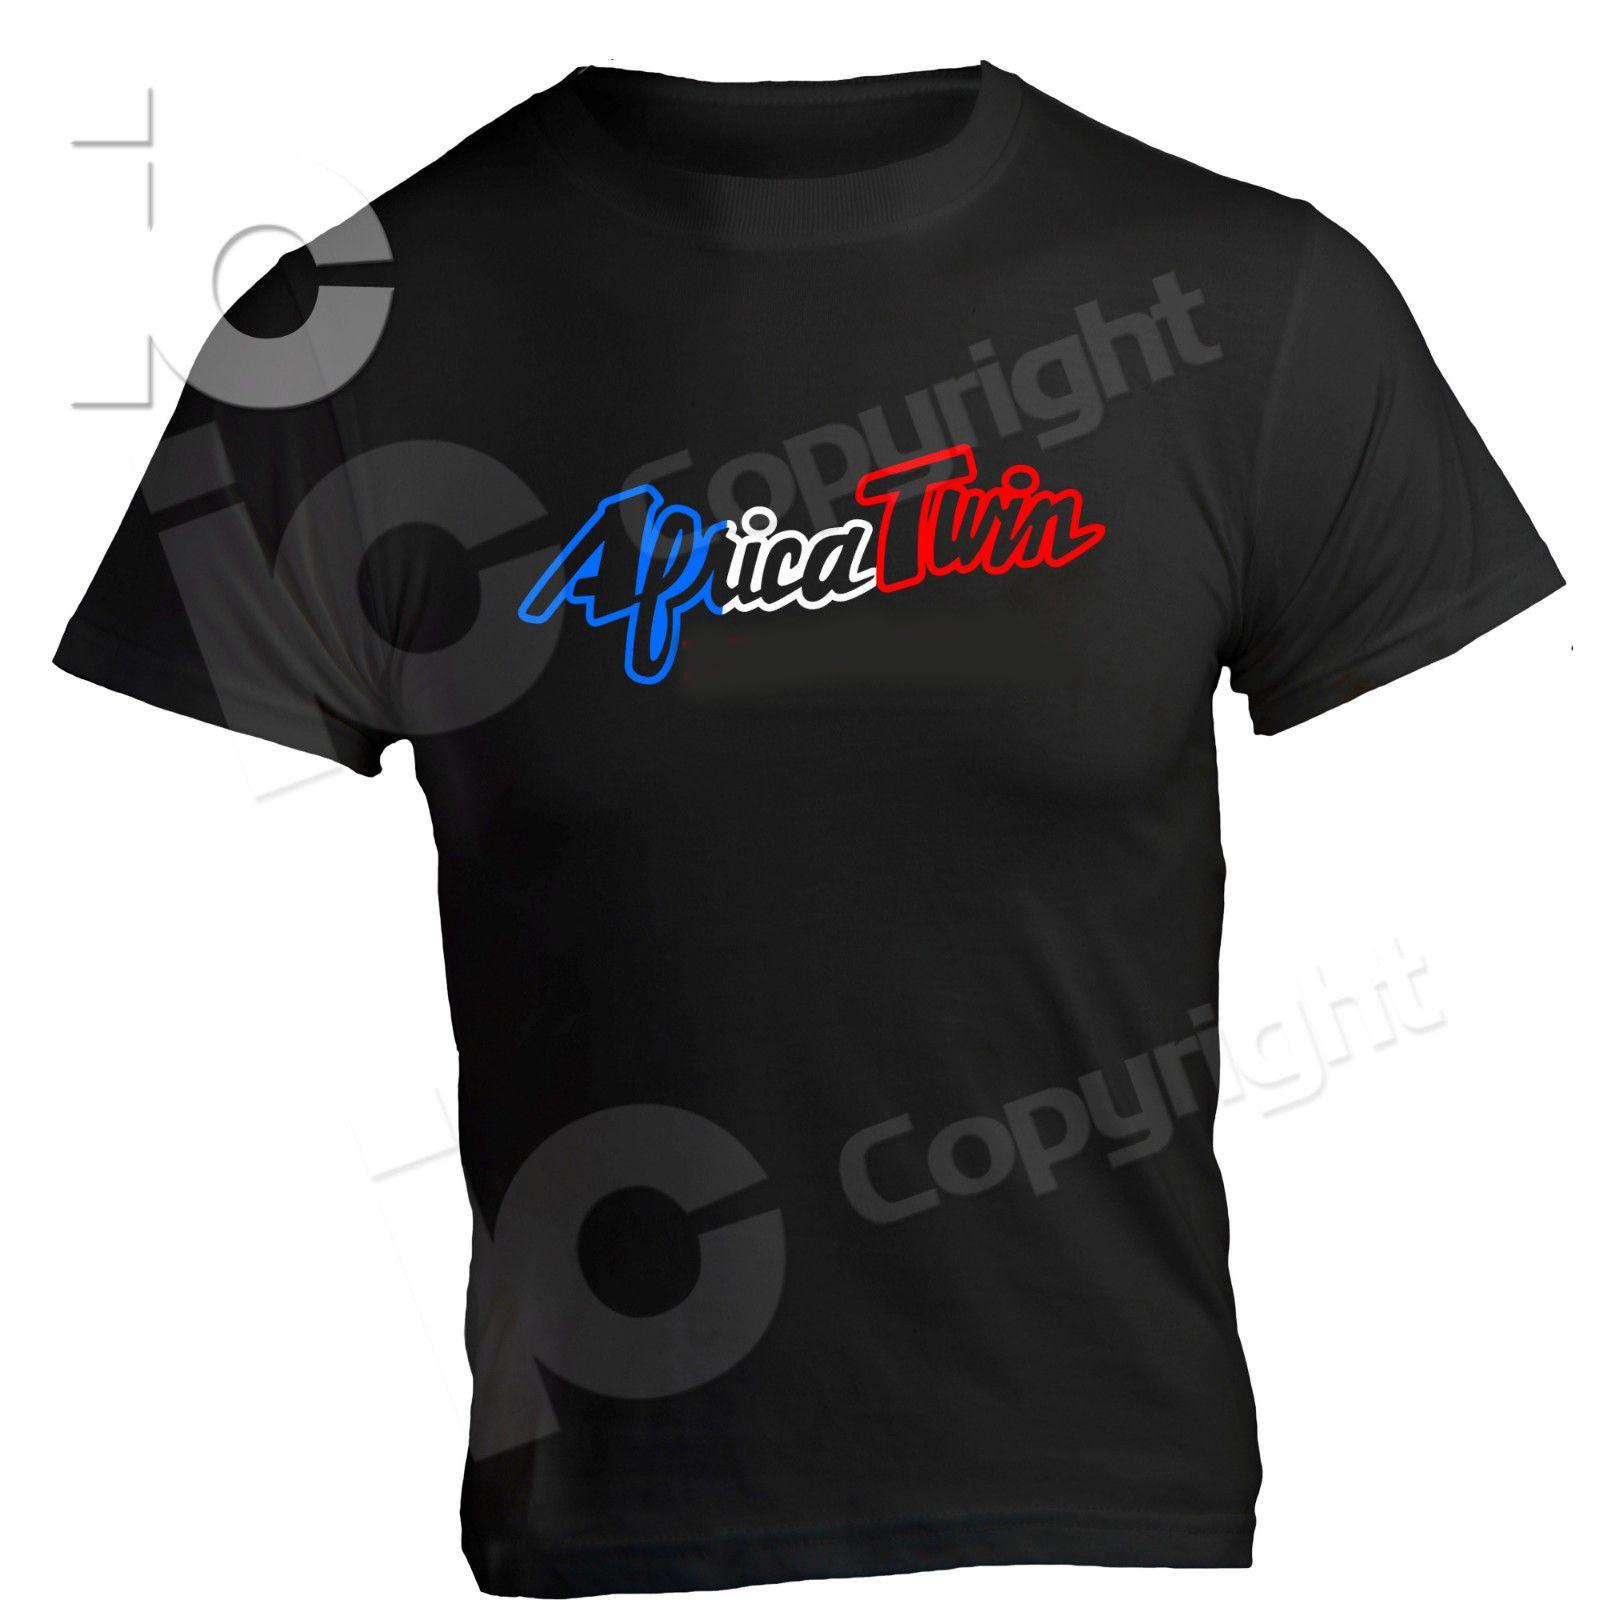 Neue Marke 2020 Motorrad-Motorrad-T-Shirt Africa Twin Crf 1000 Legend Jahrgang